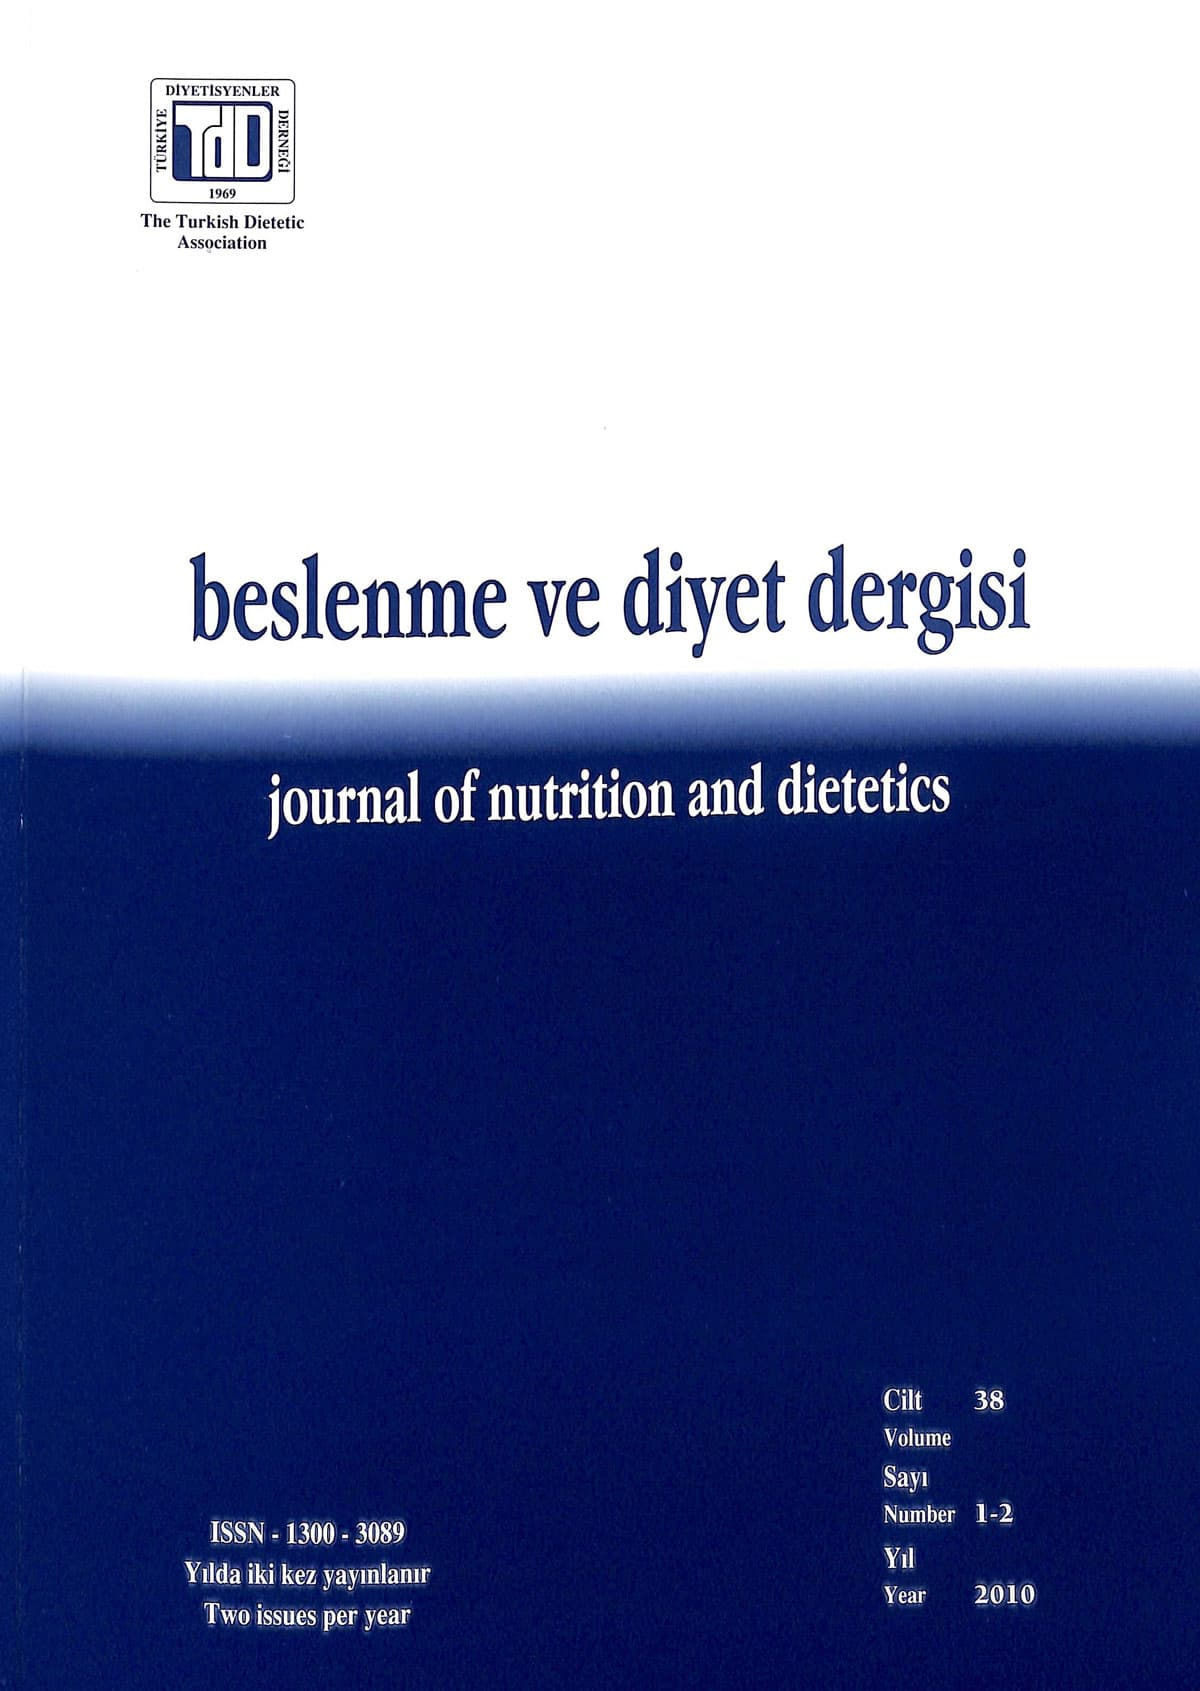 Cilt 38 Sayı 1-2 (2010)